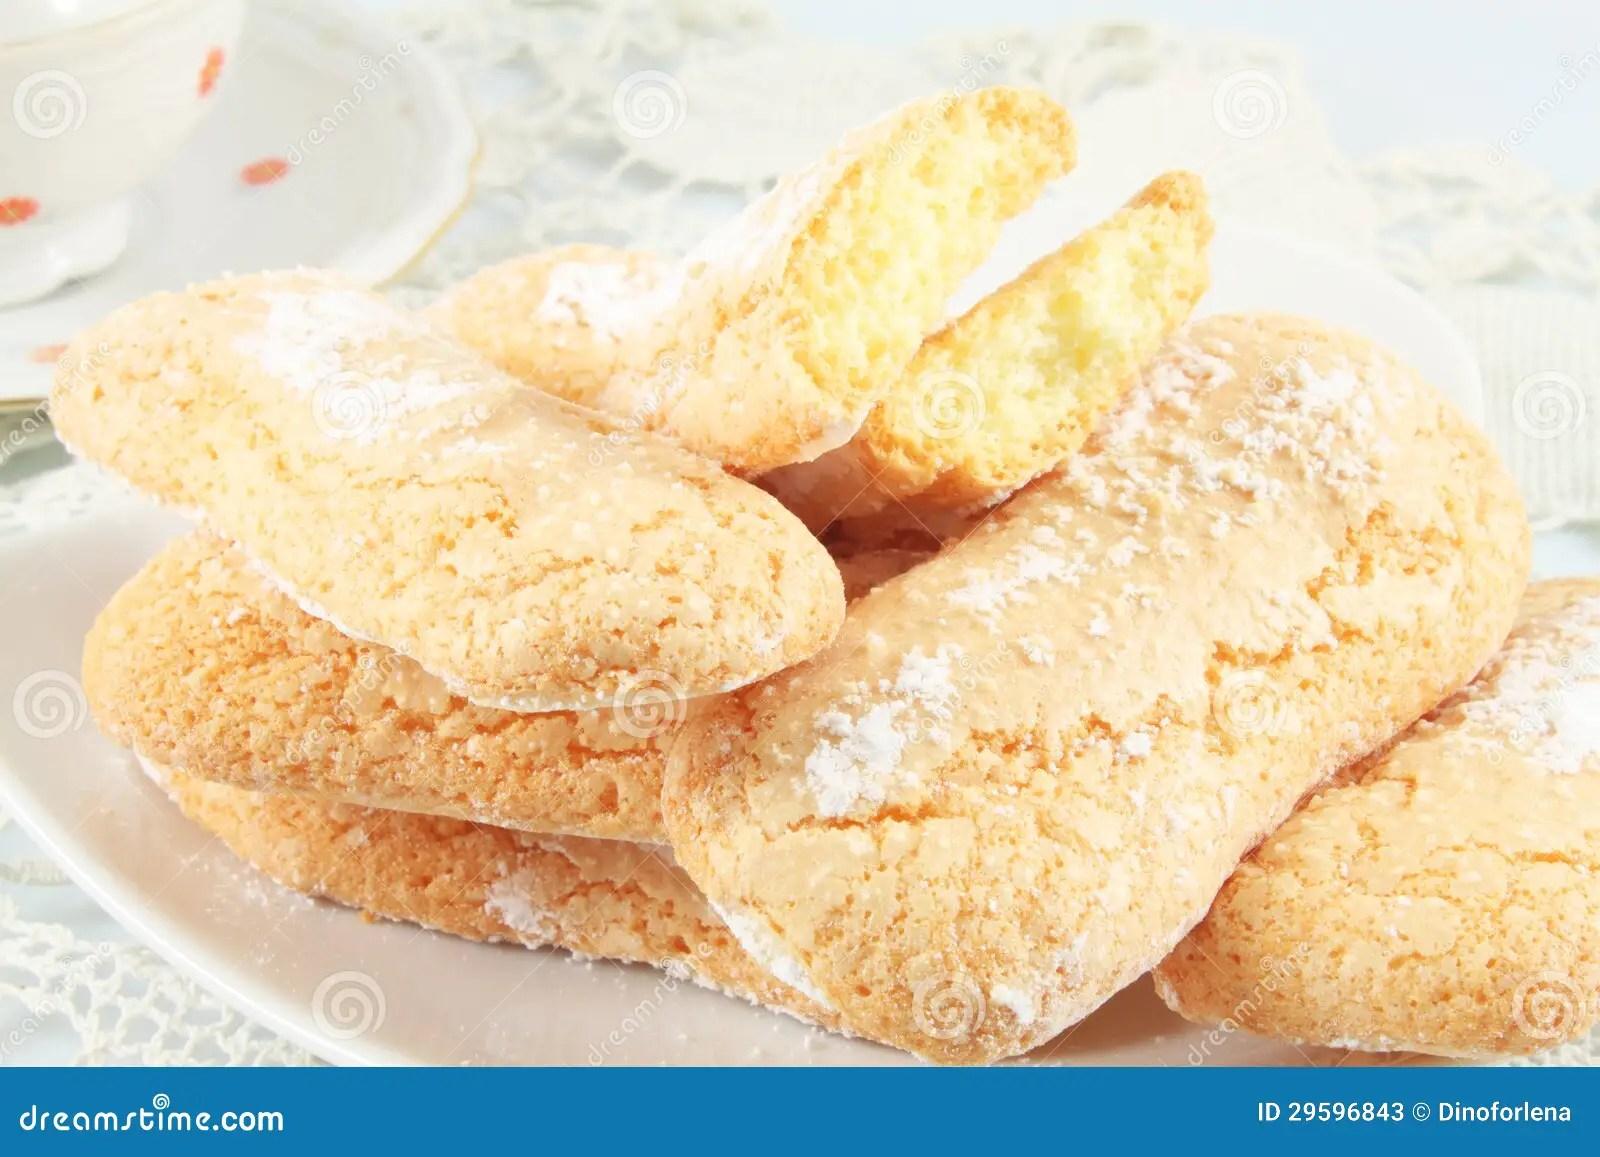 Savoiardi Cookies Ladyfingers Stock Photos Image 29596843